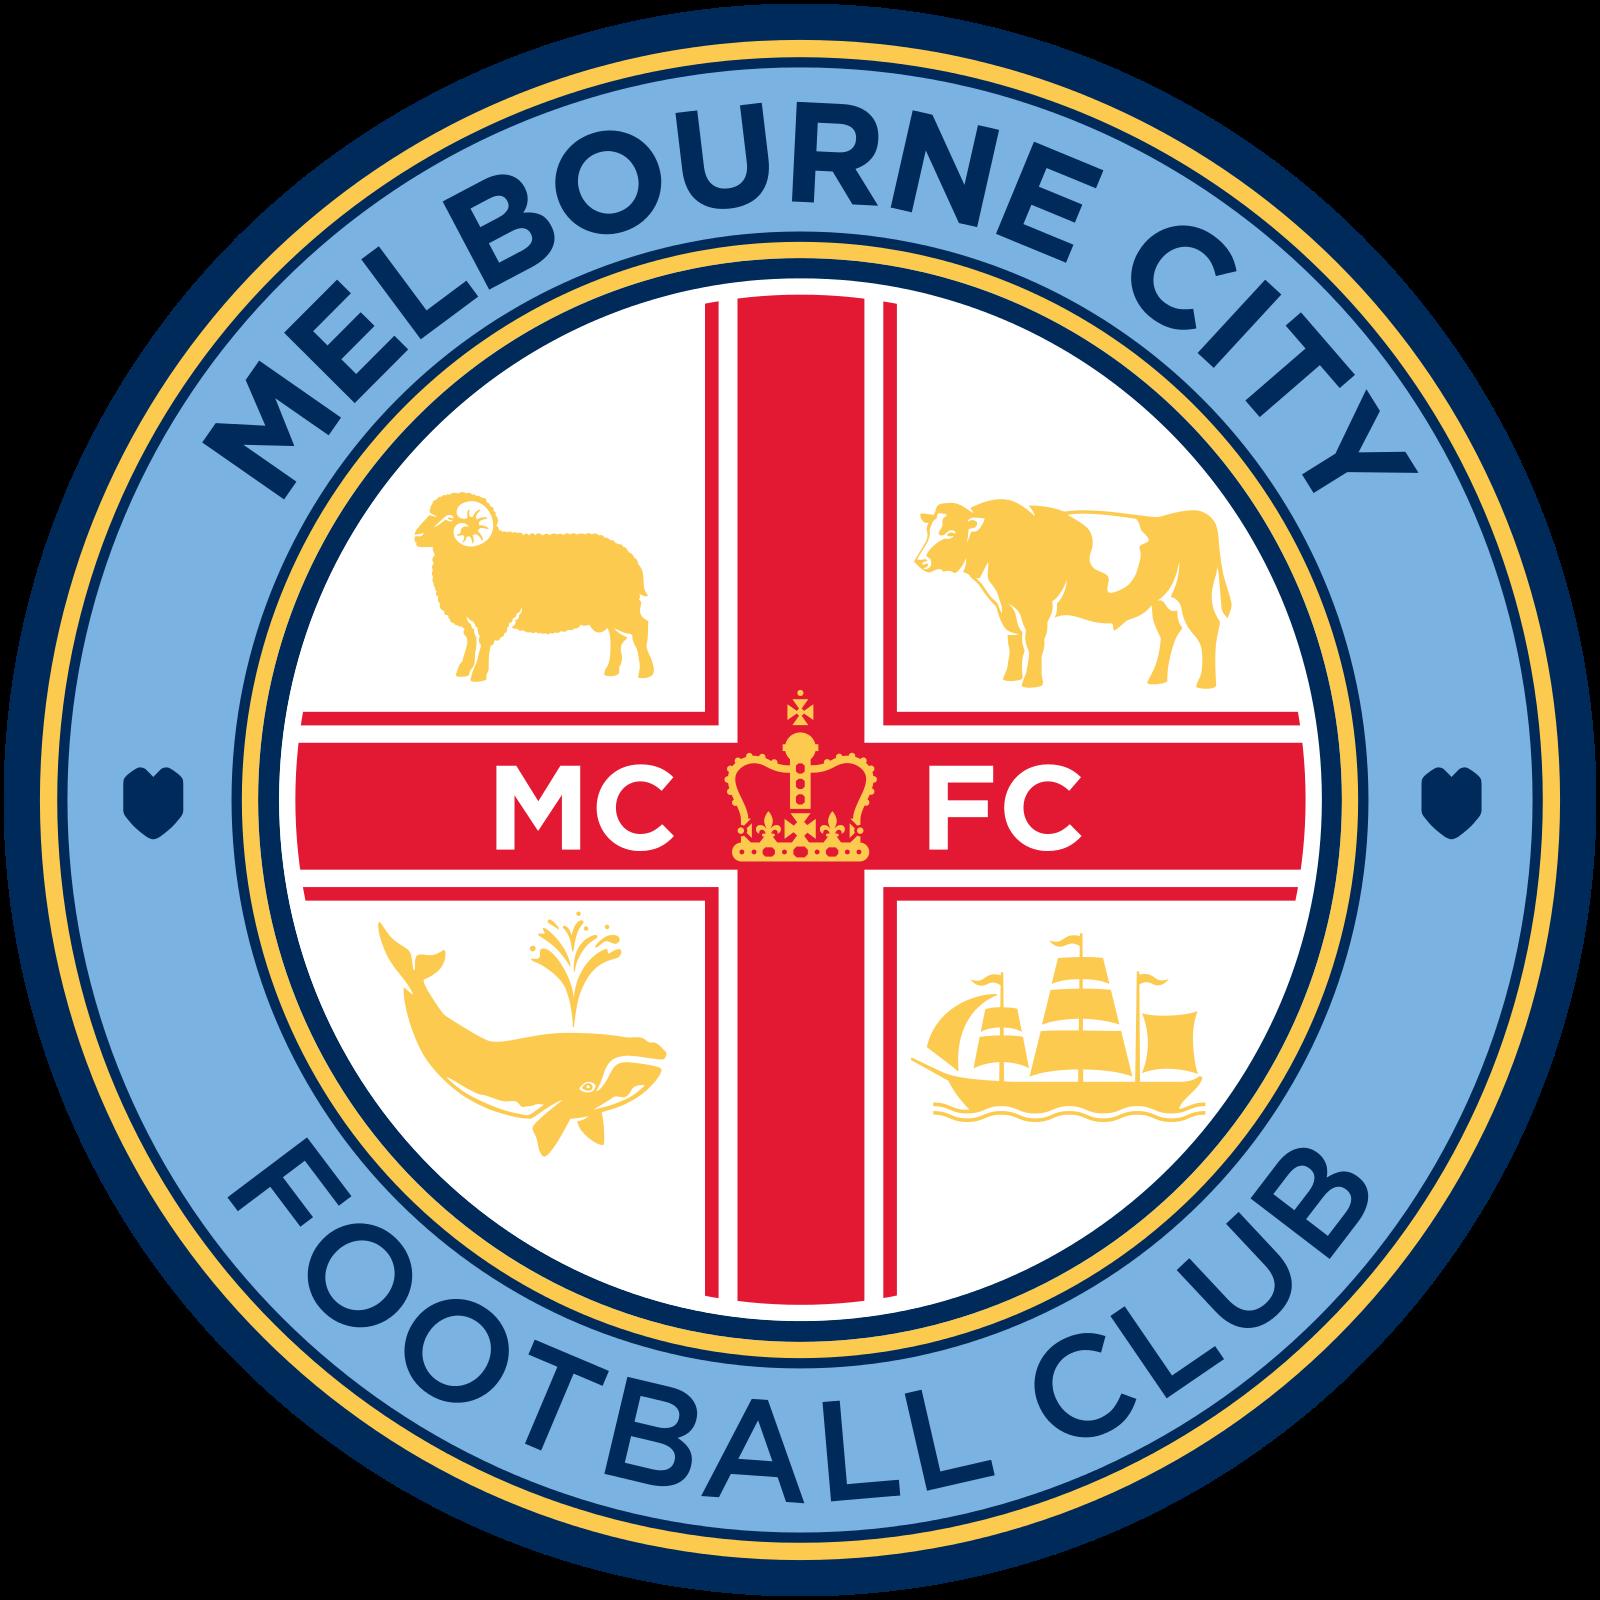 New Manchester City Crest Revealed